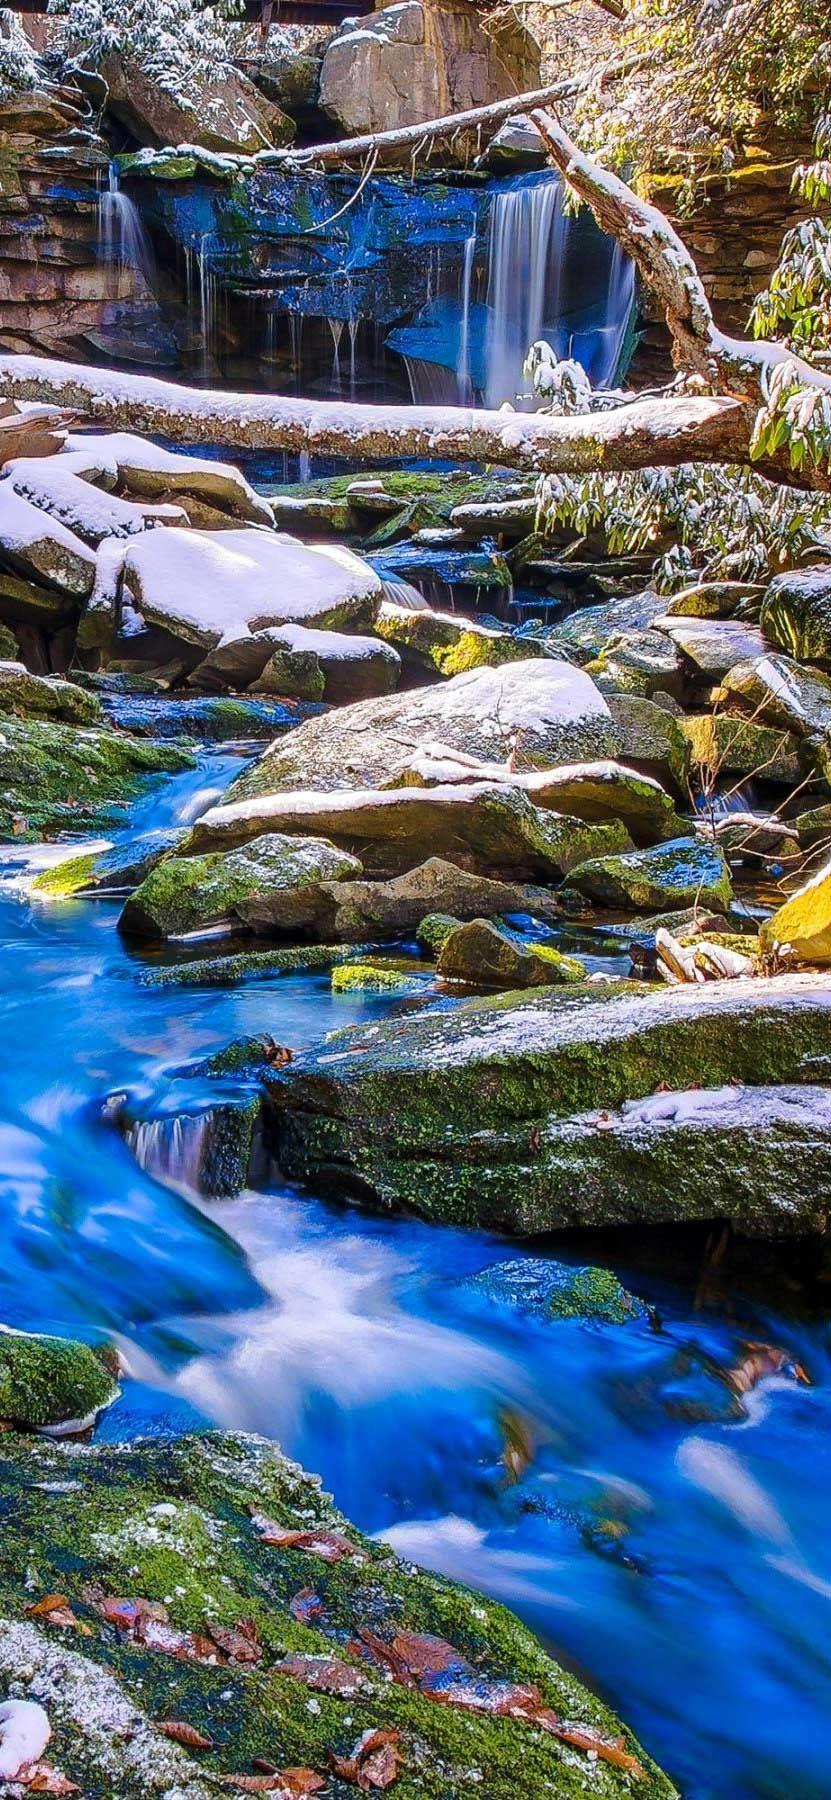 Iphone X Wallpaper Water Stream Forest Blue Rocks Hd Hd Best Nature Wallpapers Water Blues Rock